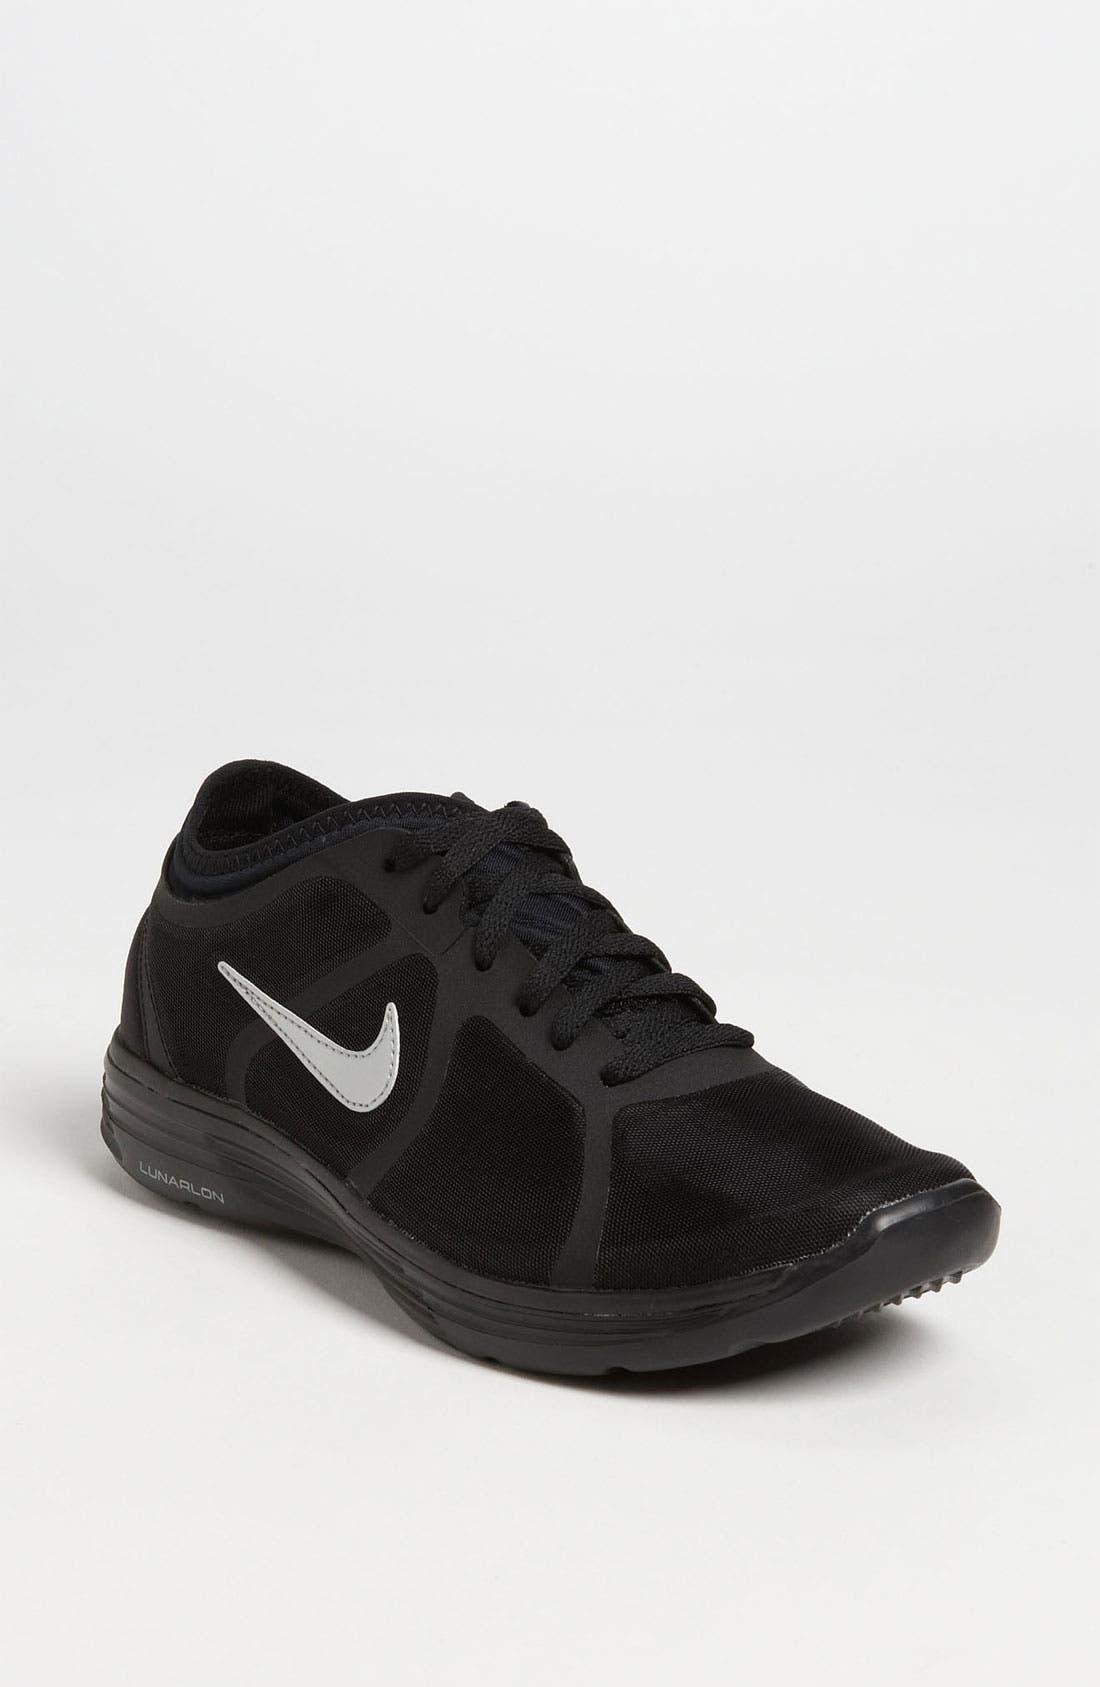 Alternate Image 1 Selected - Nike 'Lunarbase' Training Shoe (Women)